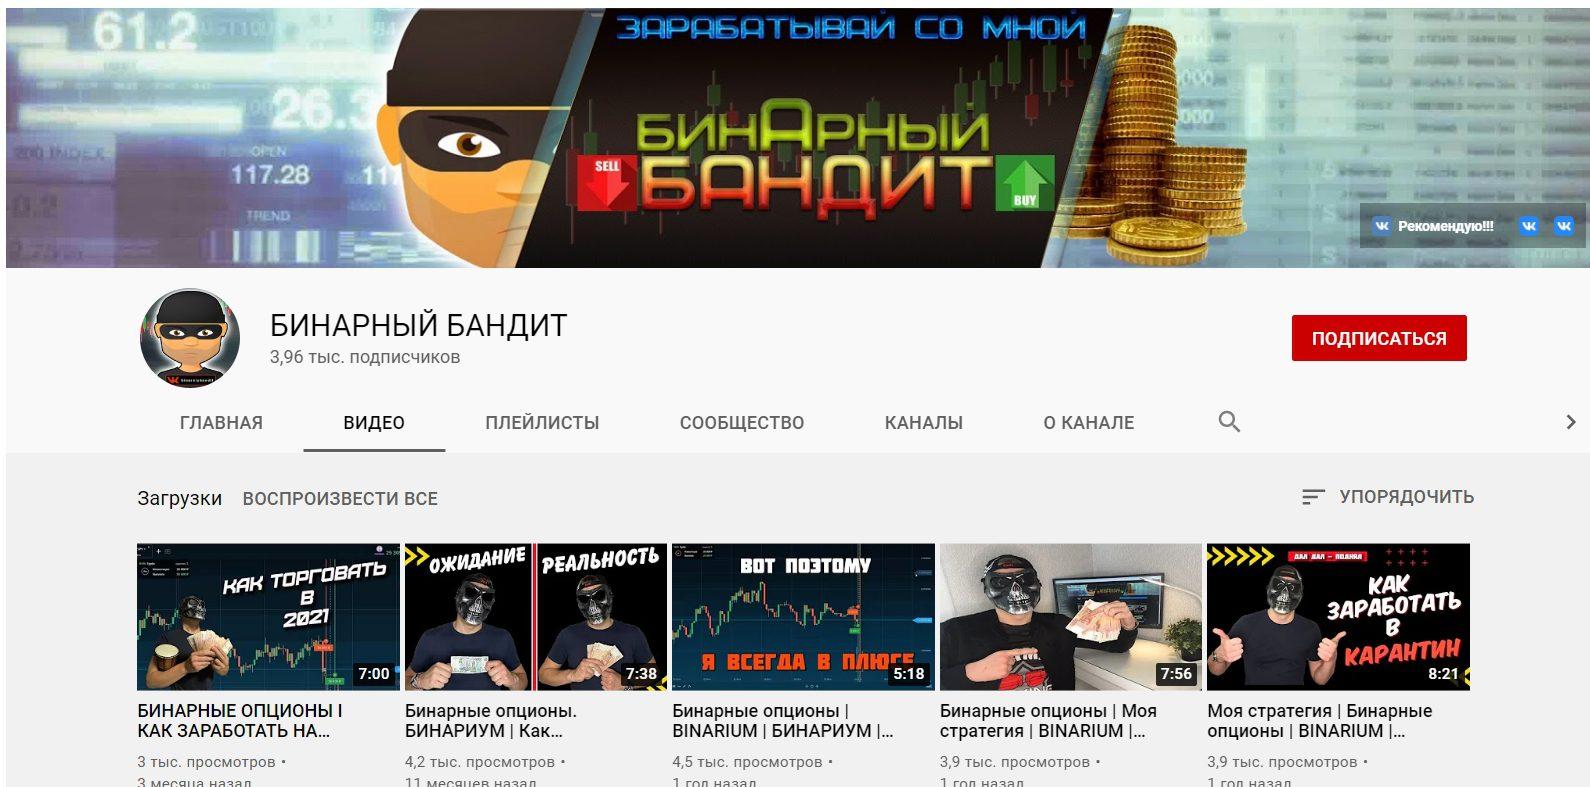 YouTube-канал Бинарного бандита